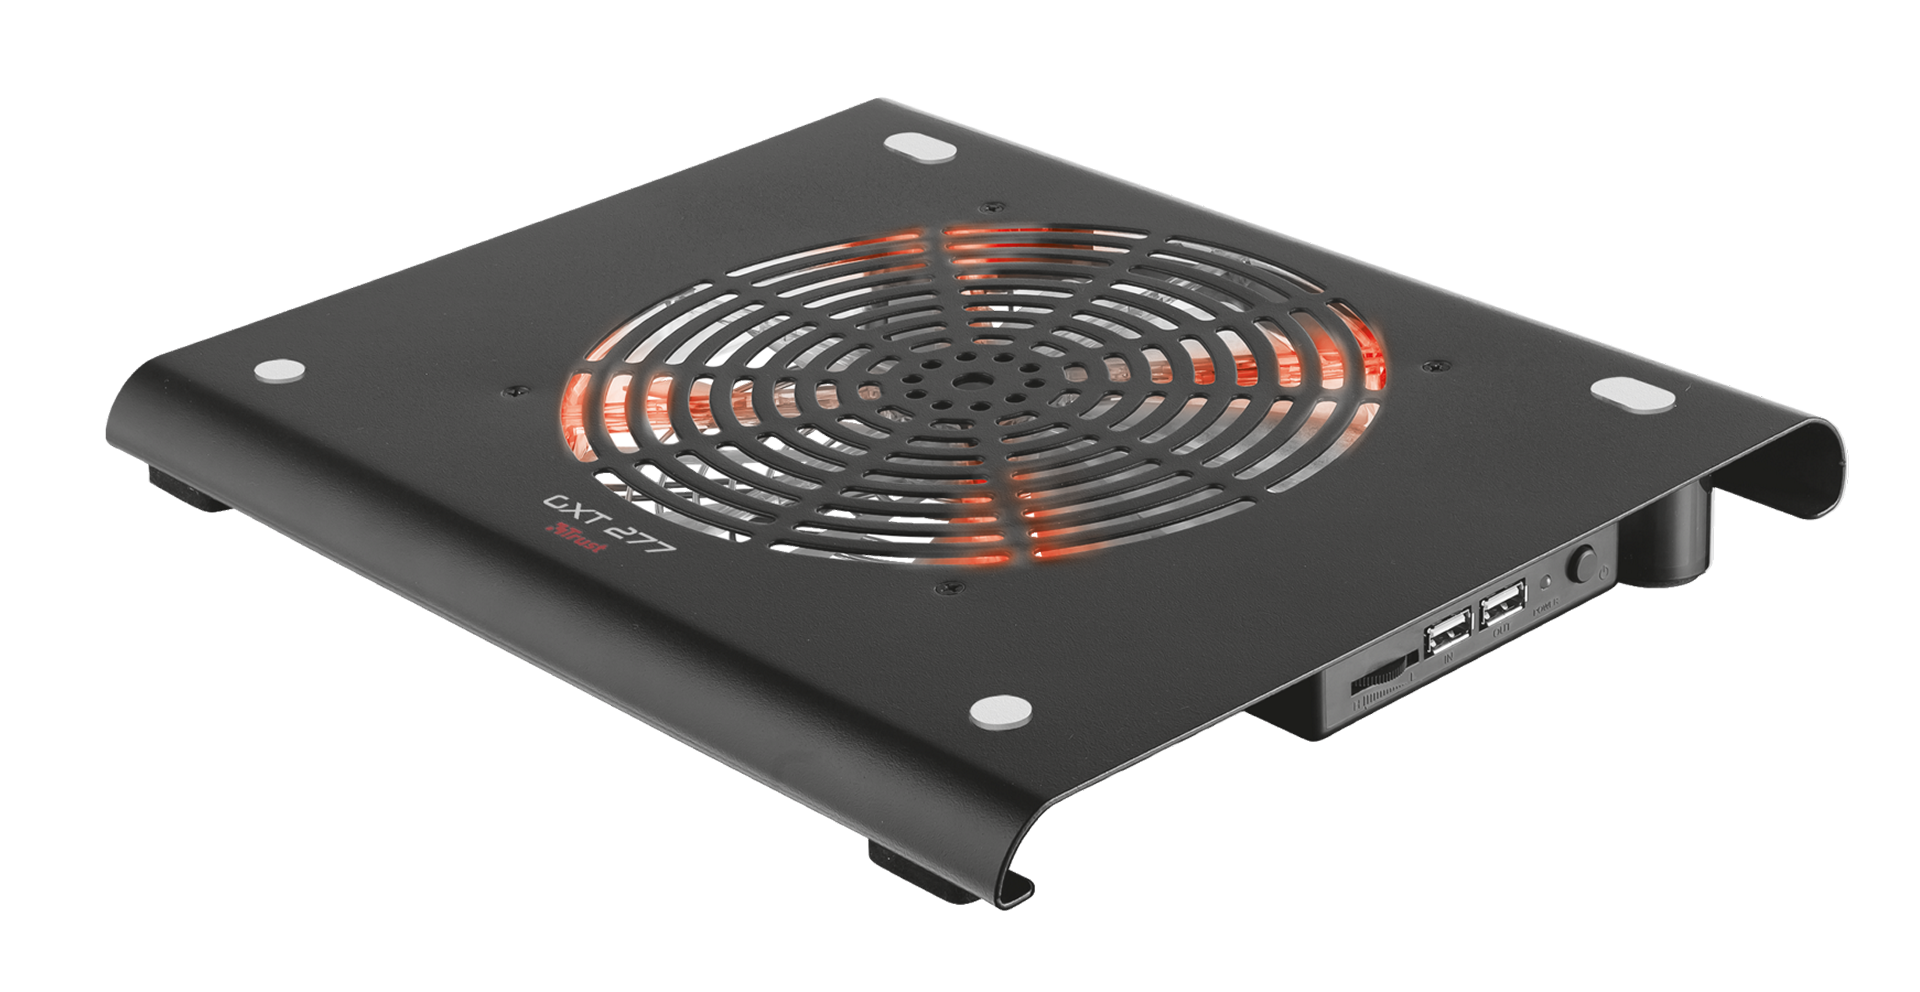 stojan TRUST GXT 277 Notebook Cooling Stand